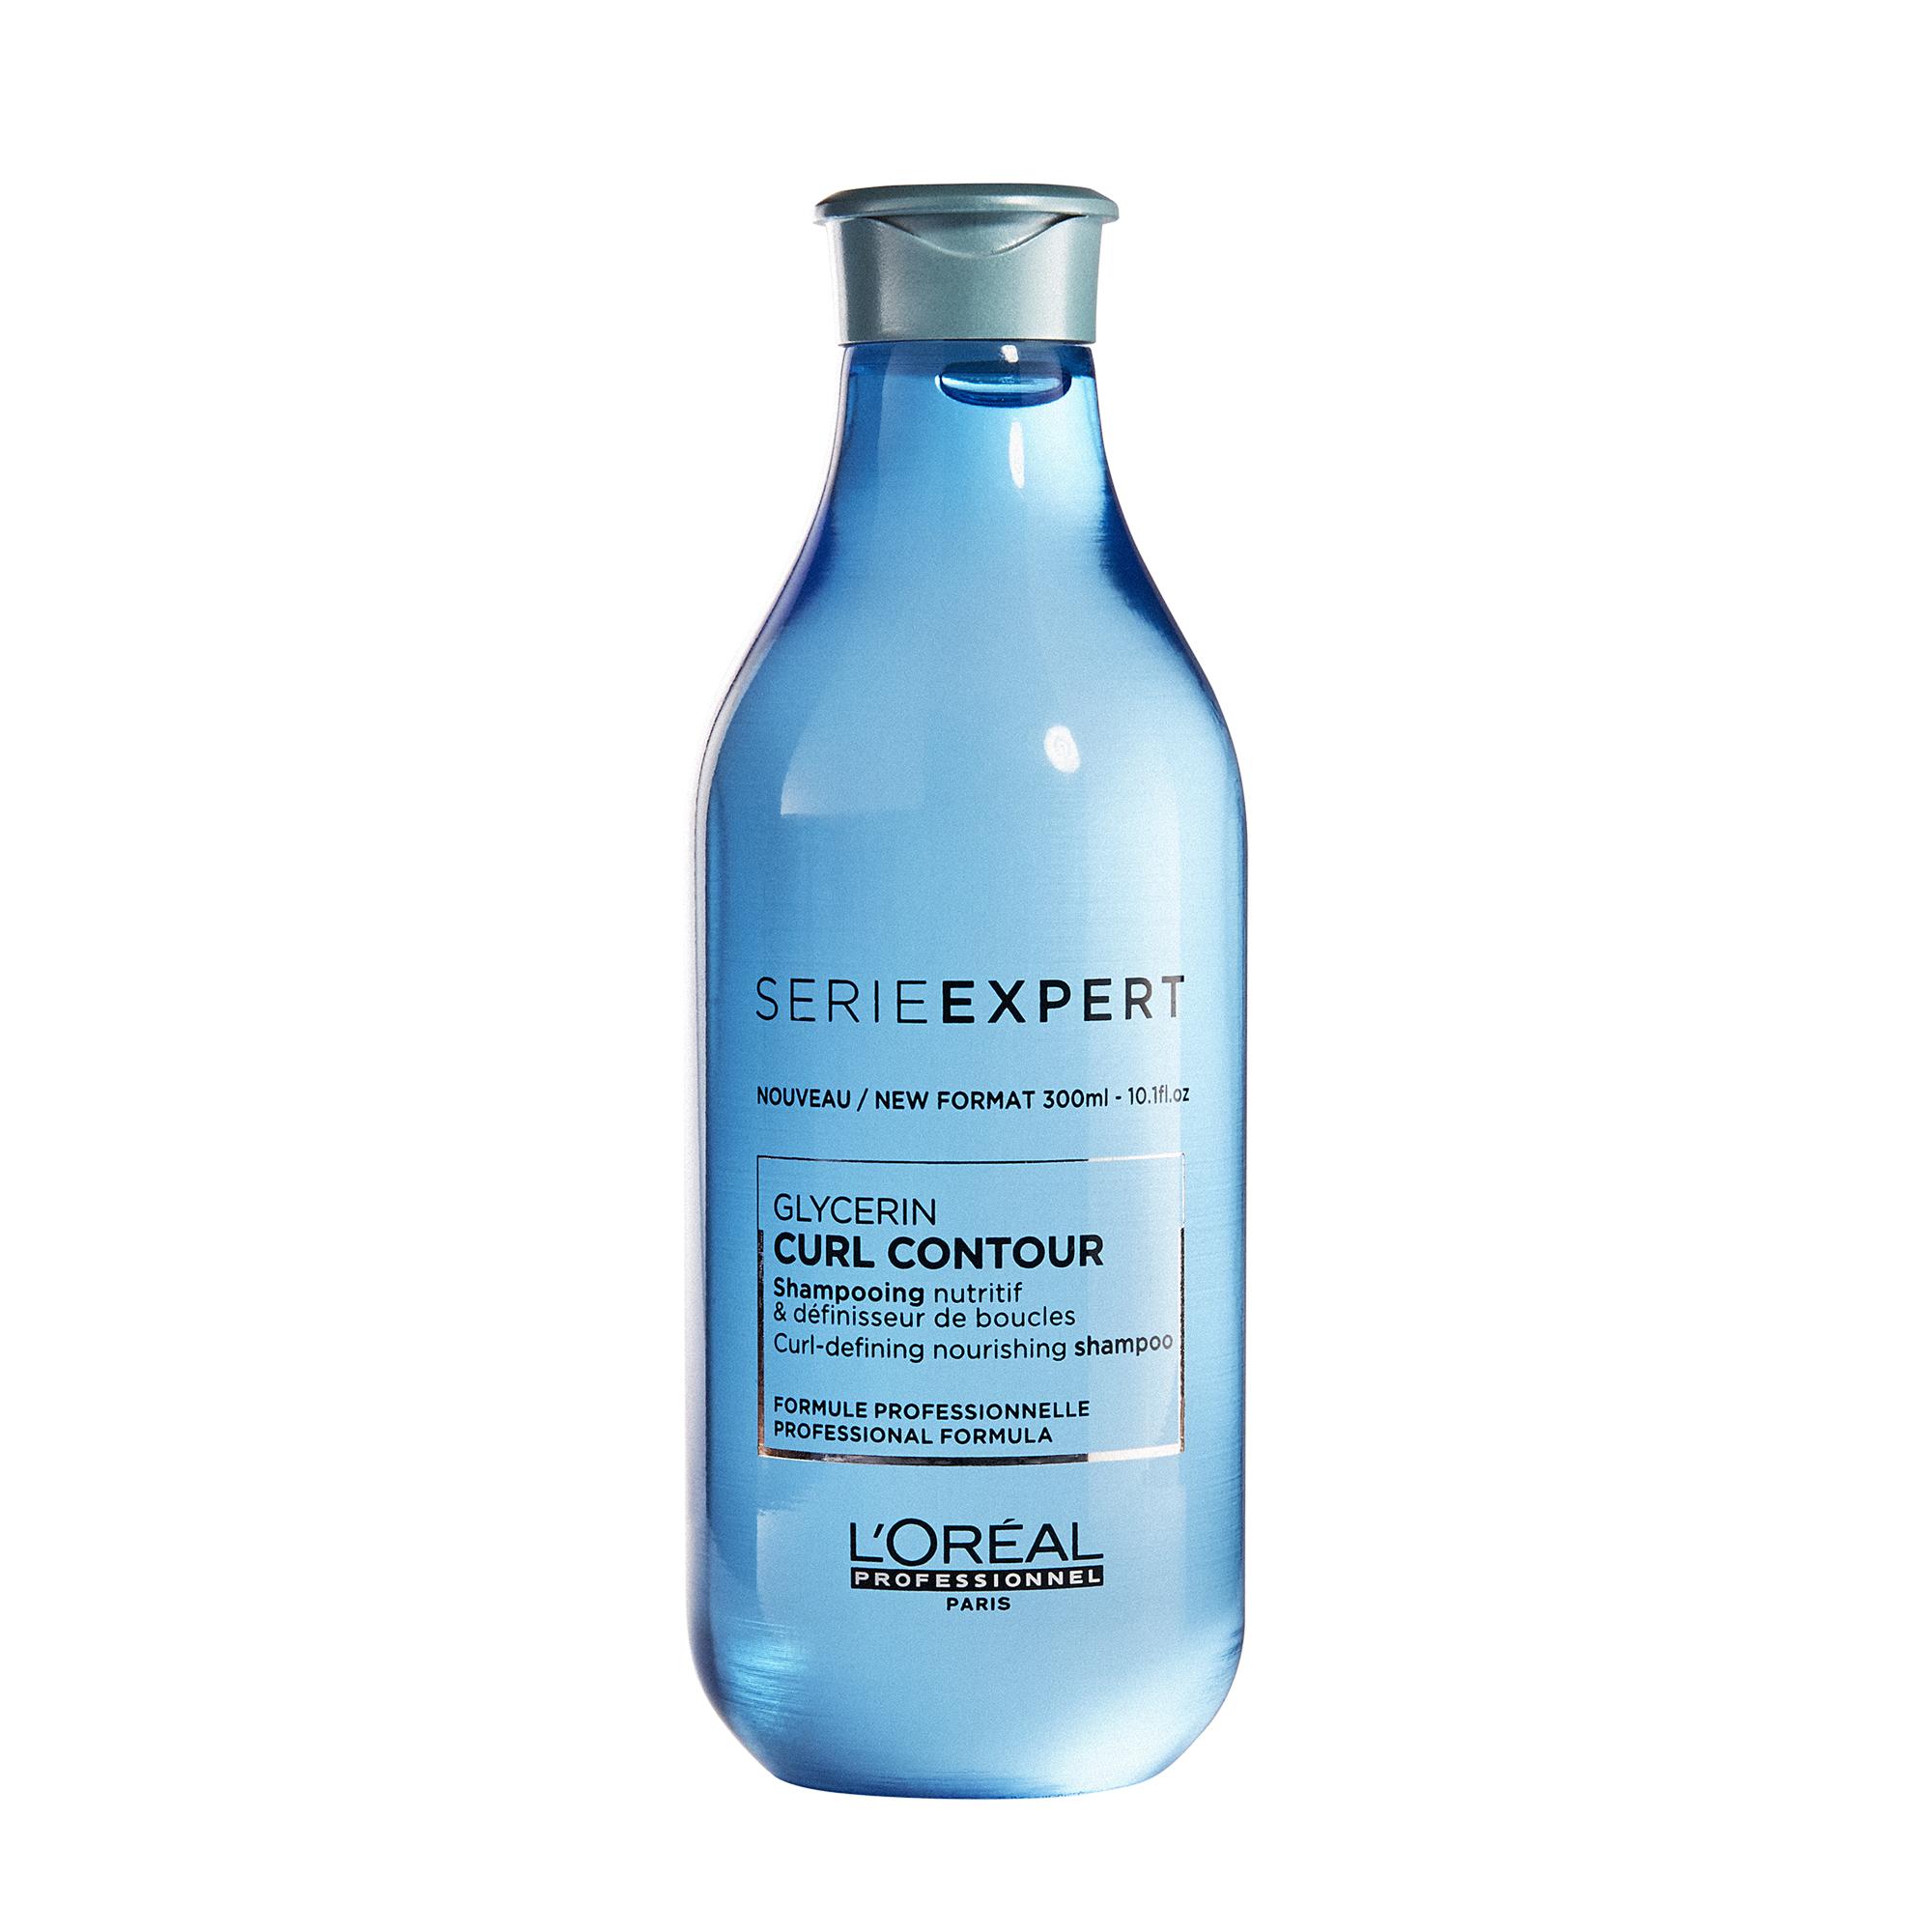 Série Expert Glycerin Curl Contour Shampoo 300ml